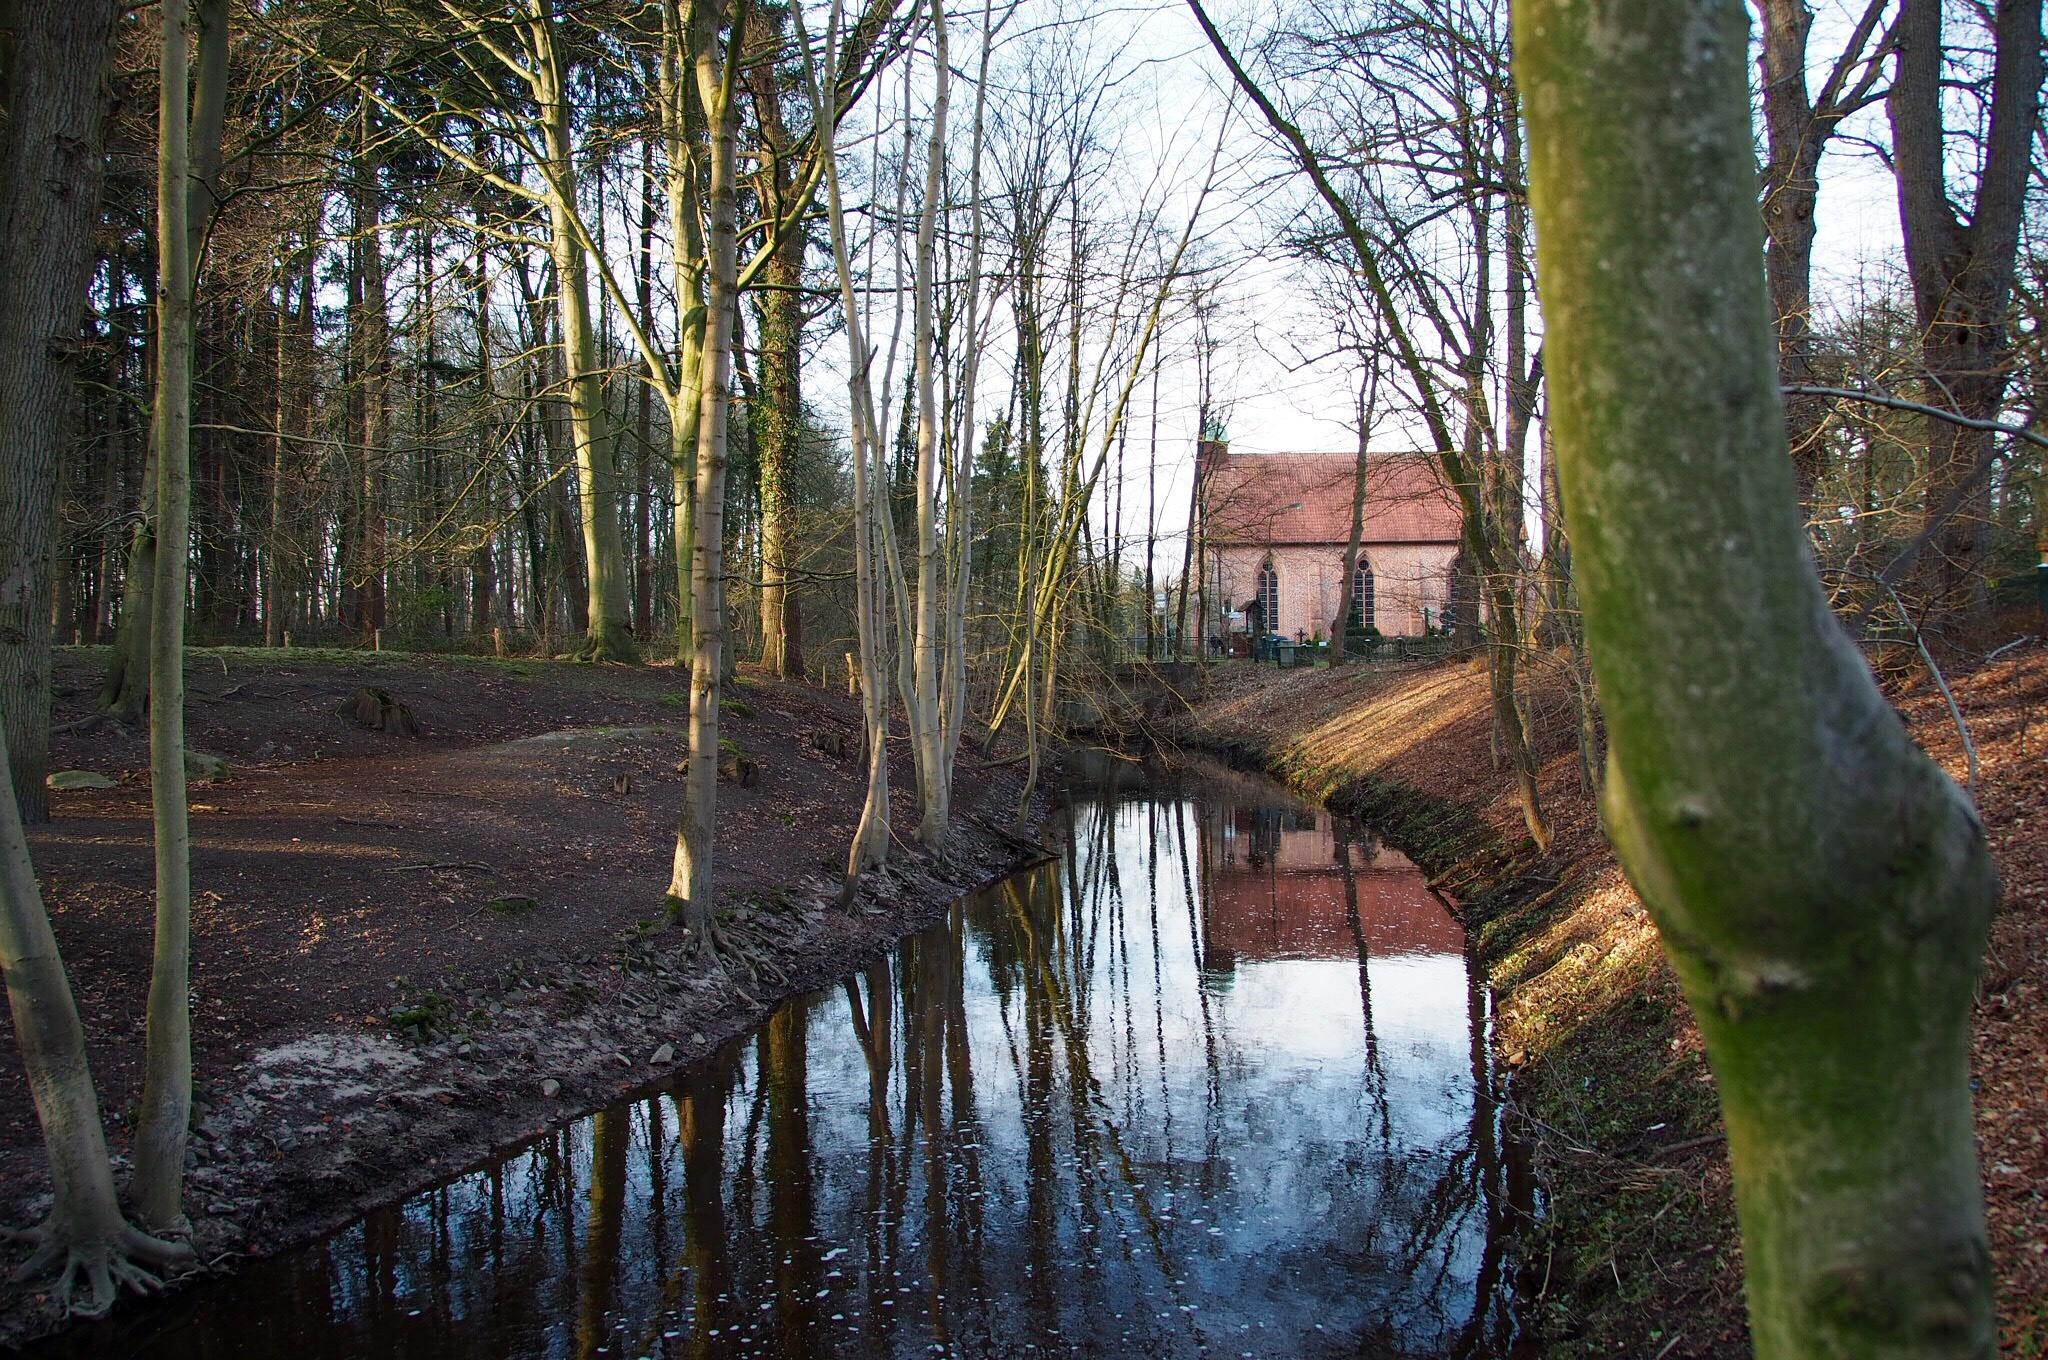 Water Reflection  by landymoni